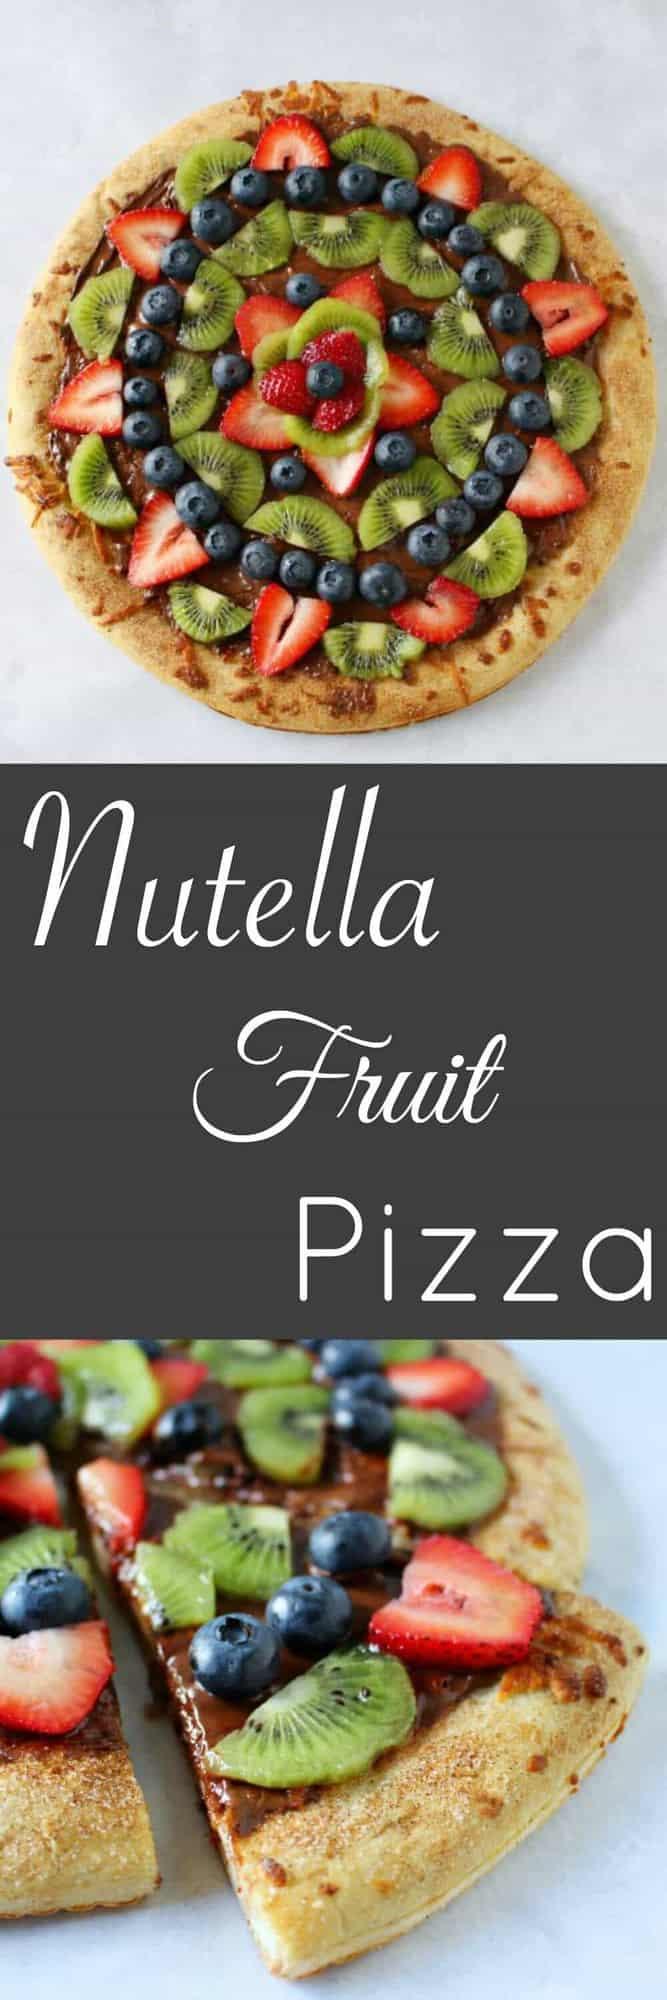 Nutella Fruit Pizza - with a cinnamon sugar crust